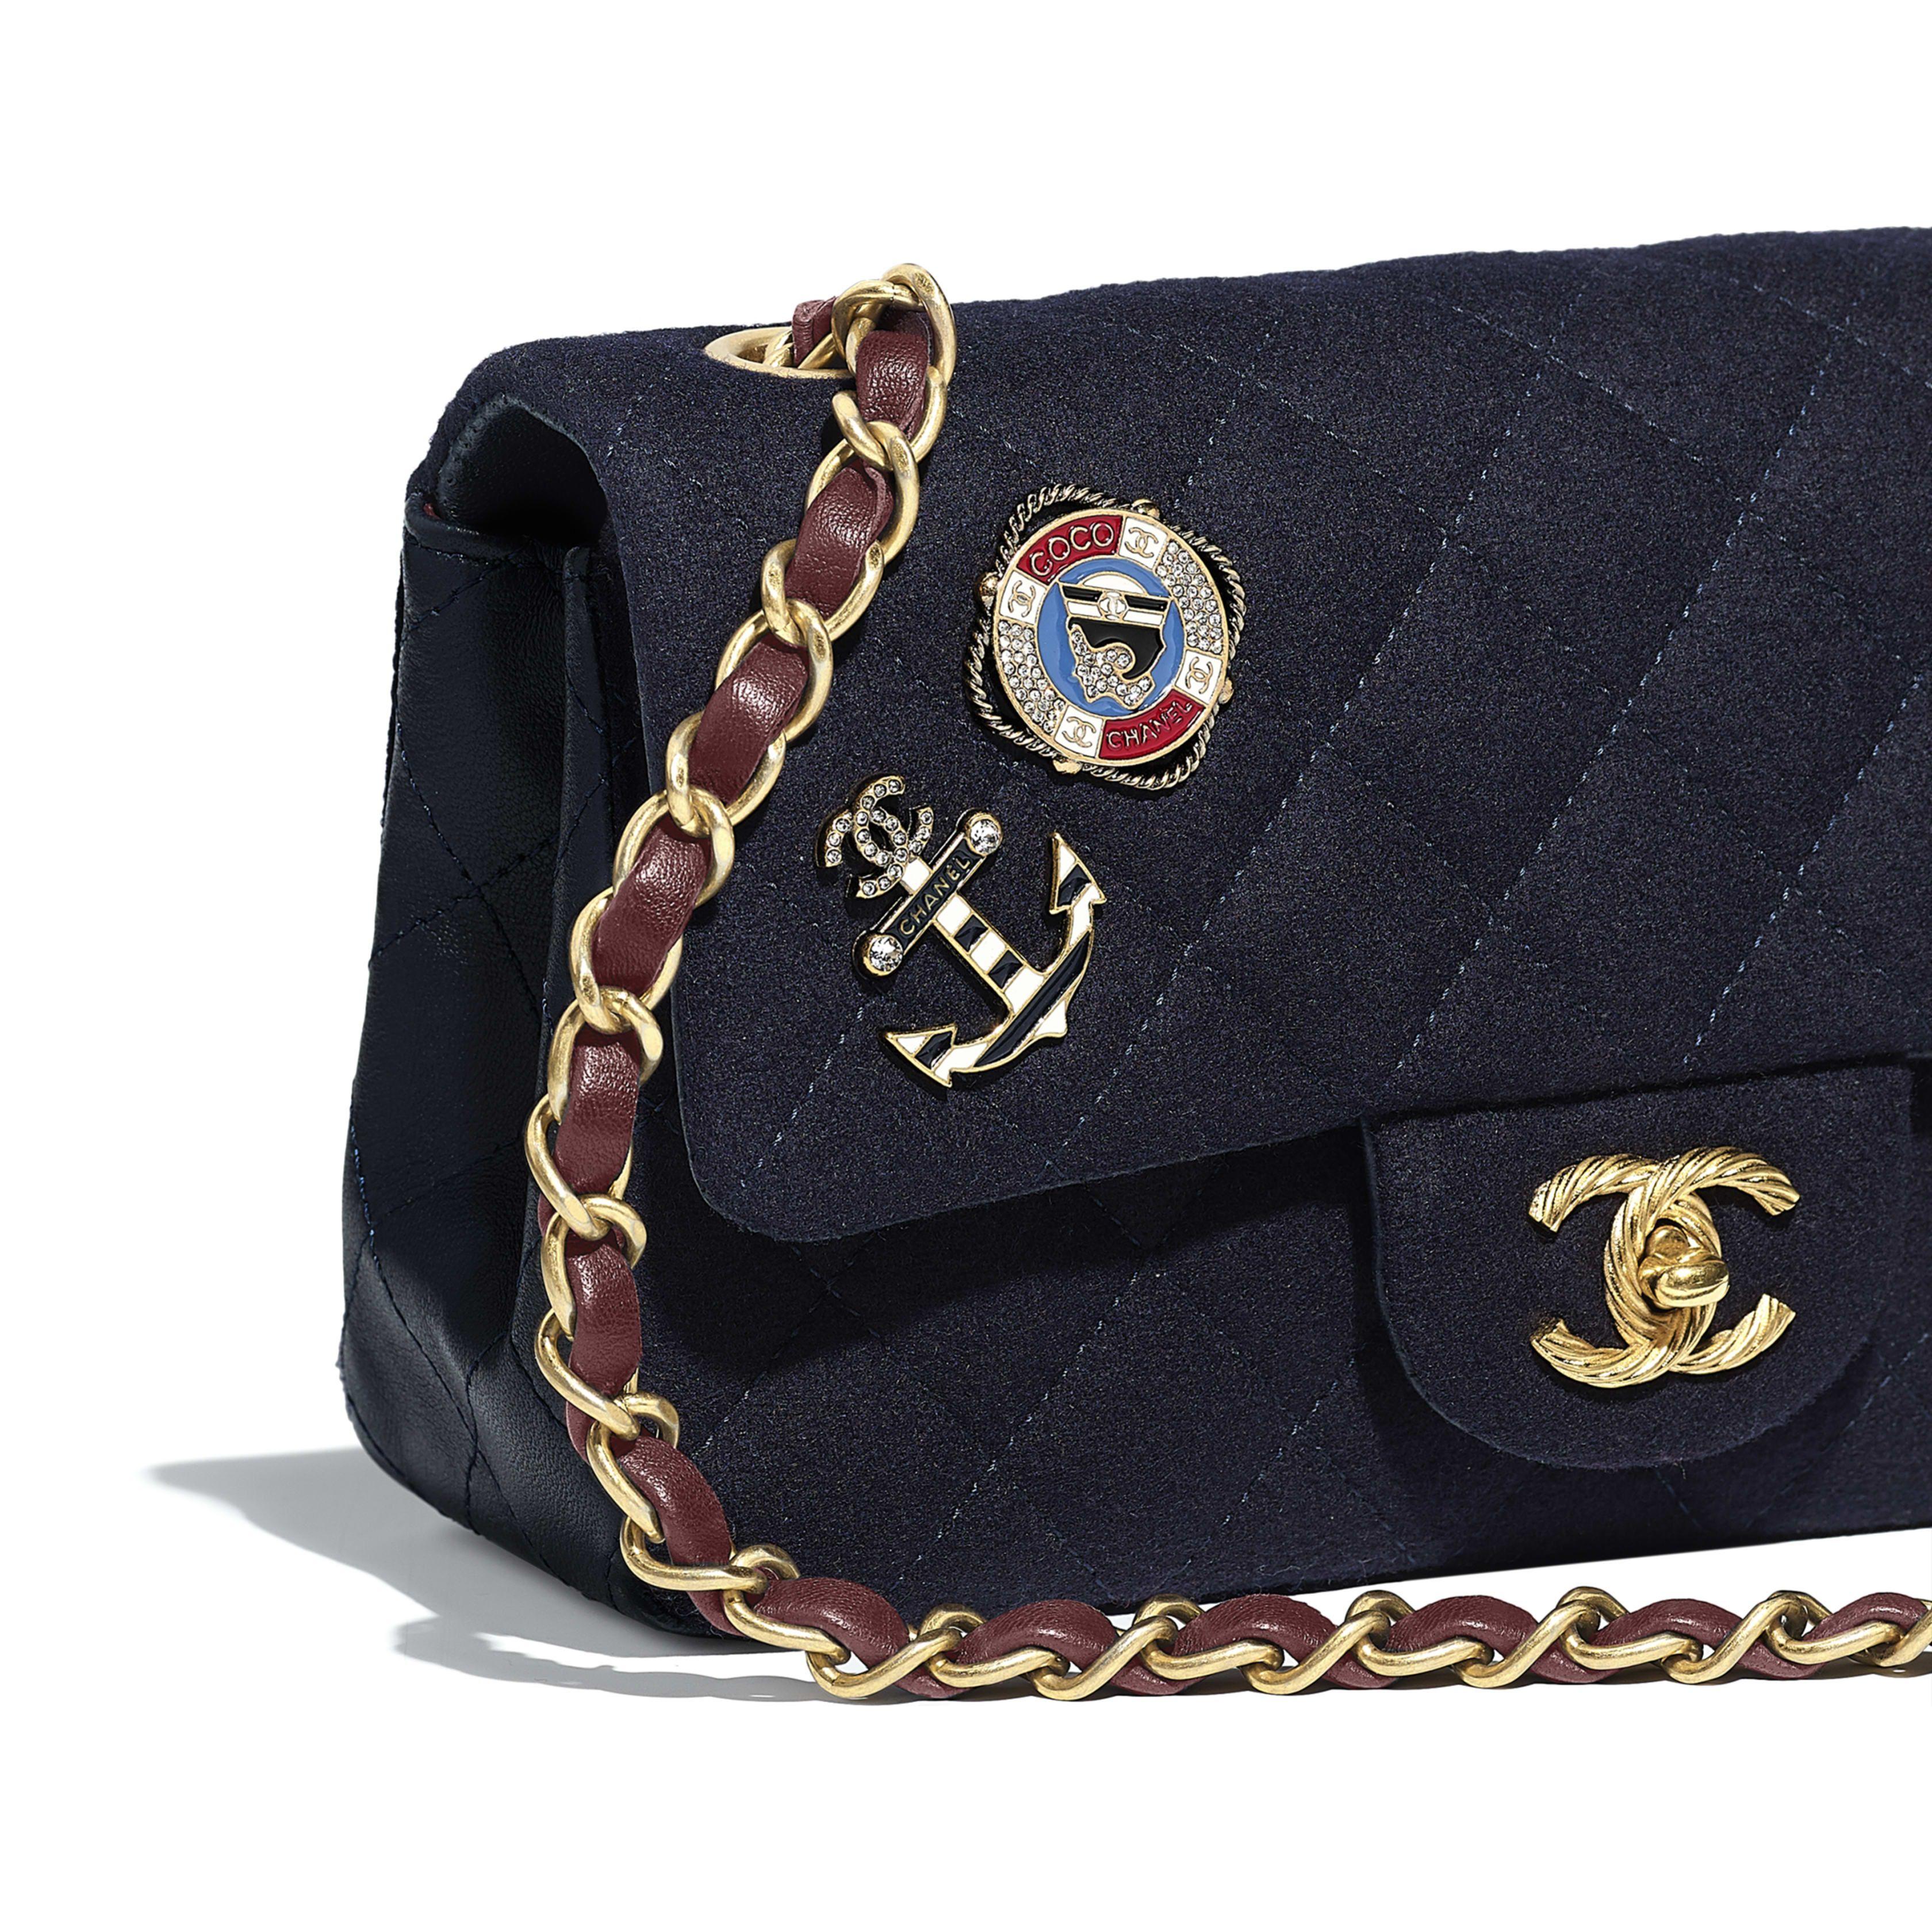 Mini Flap Bag Wool Lambskin Charms Gold Tone Metal Navy Blue